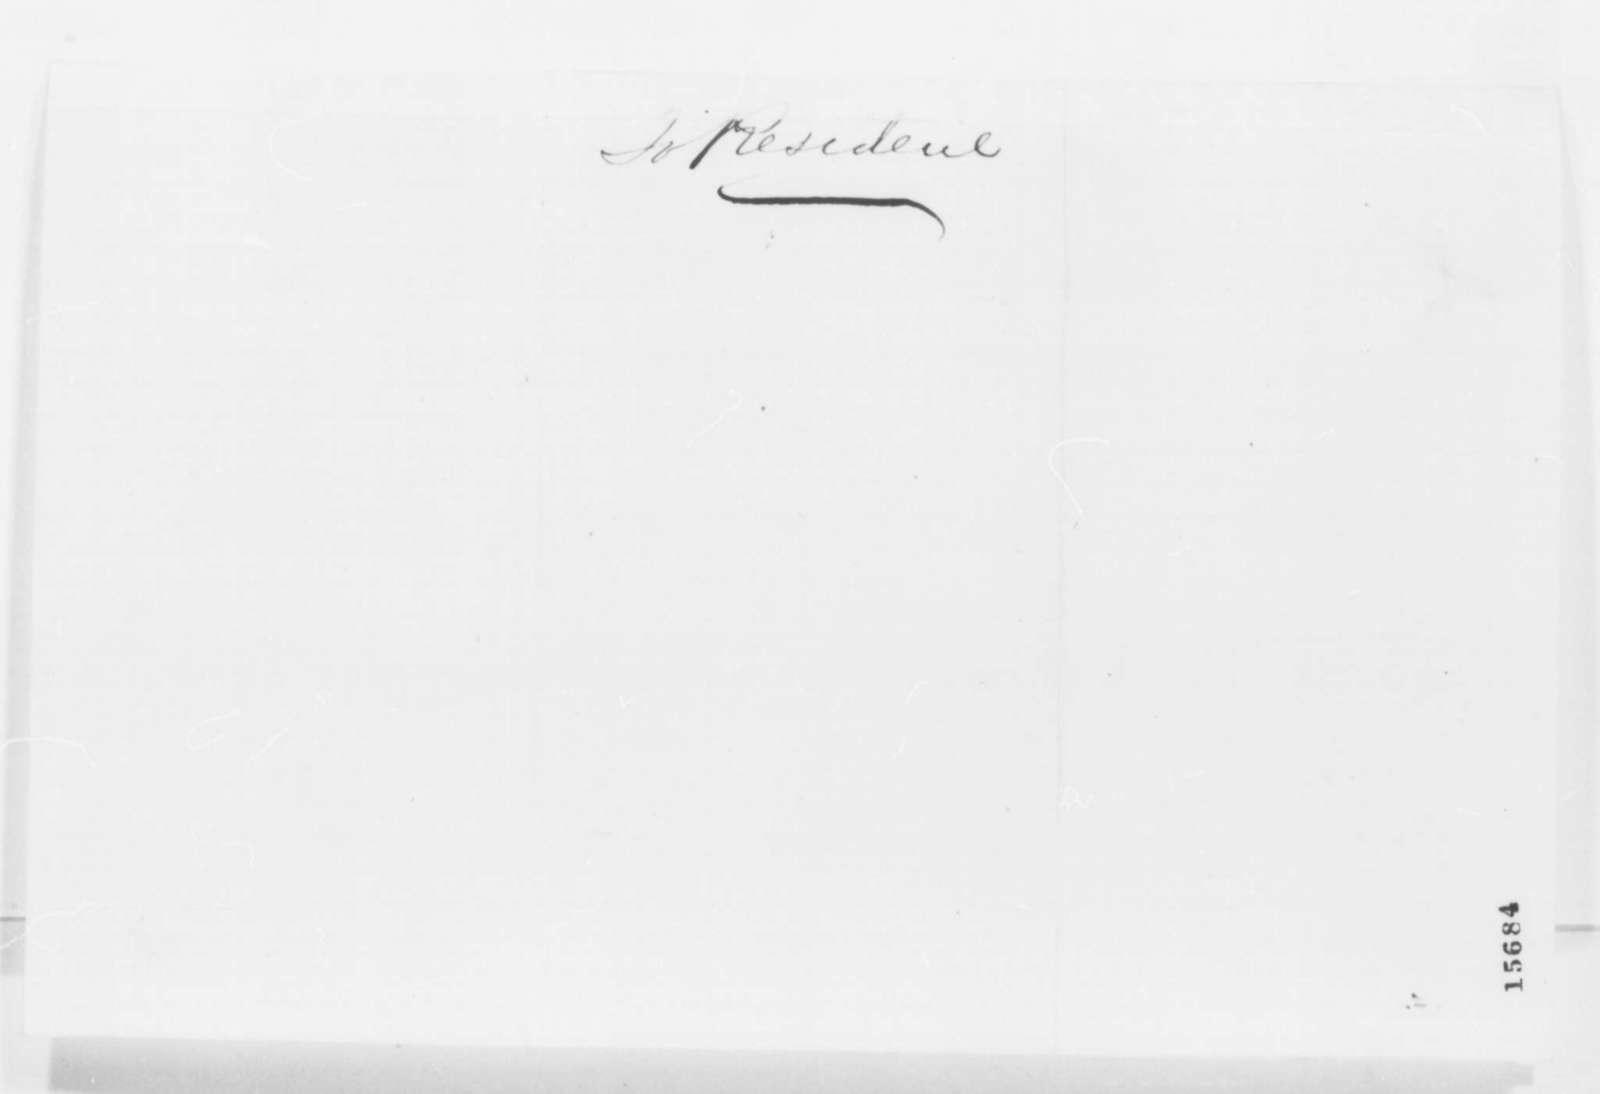 Eliakim Littell to Francis P. Blair Sr., Friday, April 25, 1862  (Recommendation)